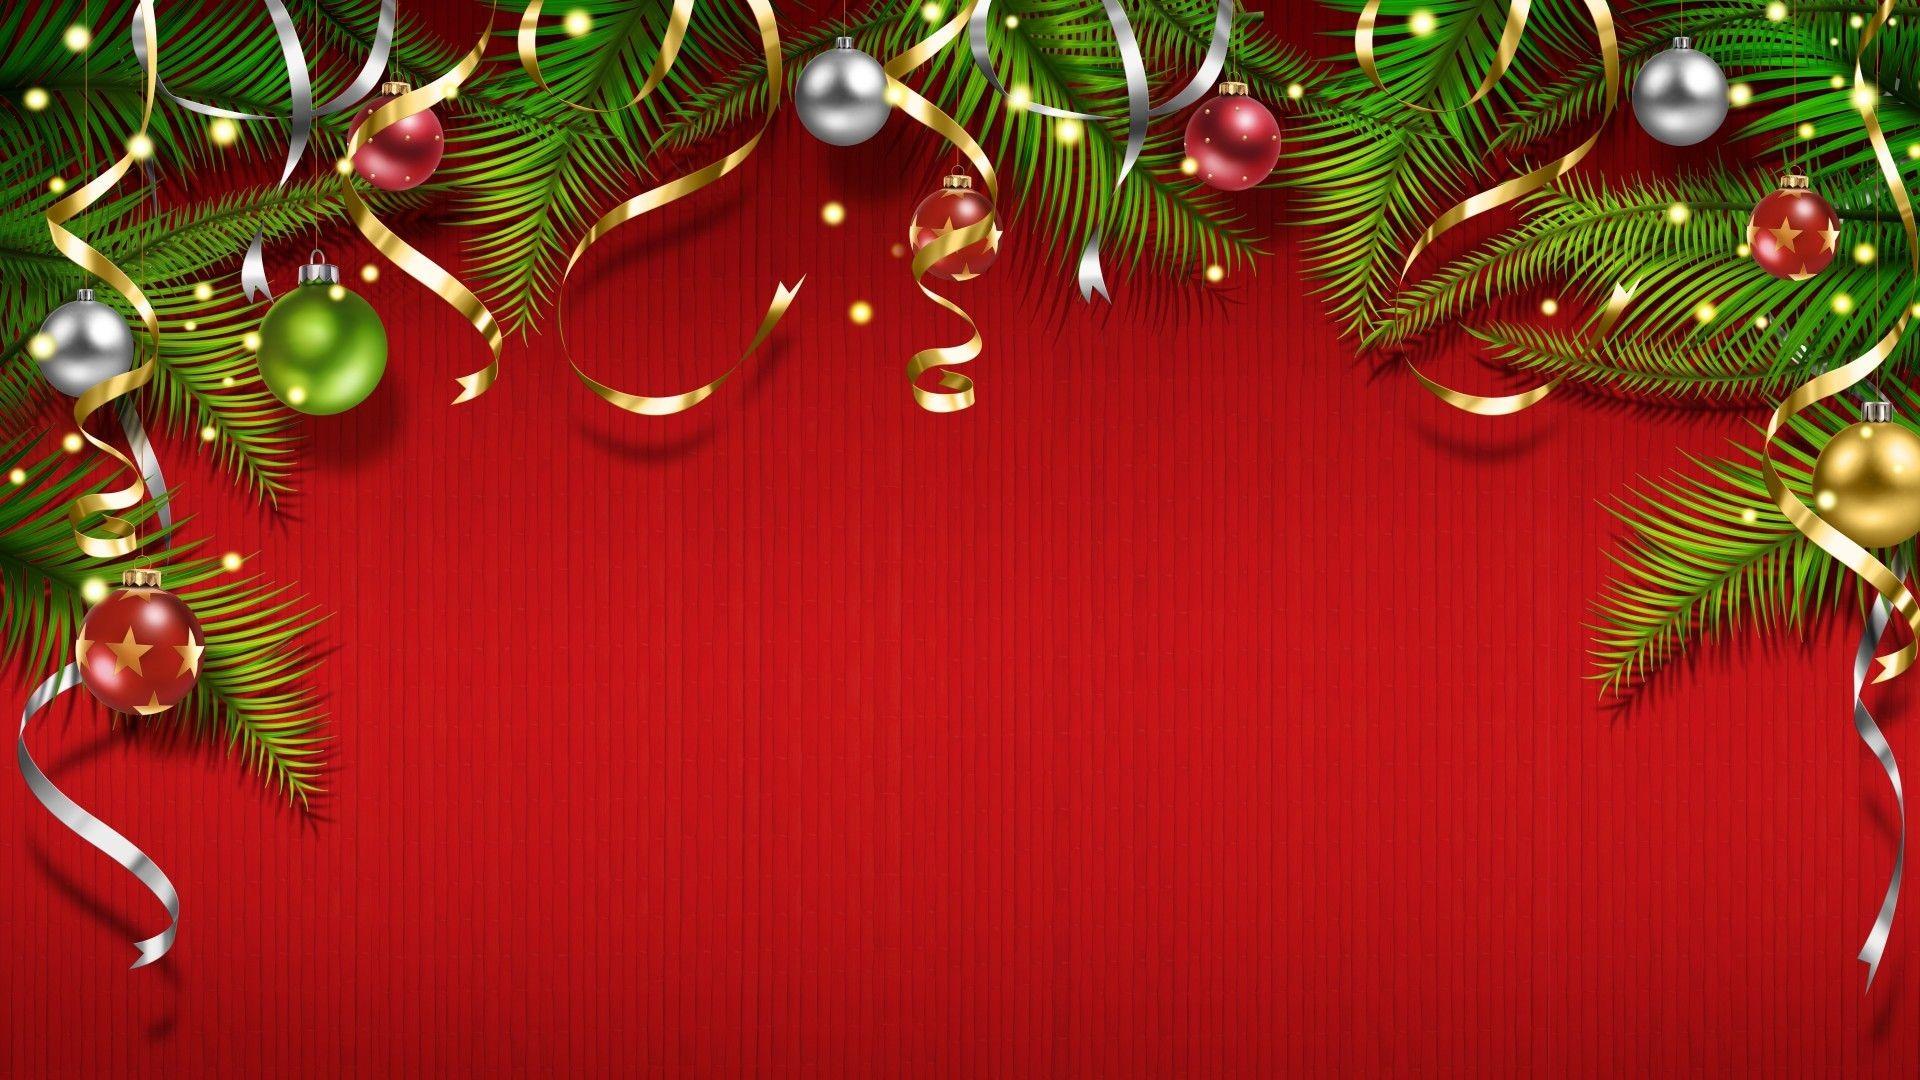 Res: 1920x1080, christmas wallpaper hd desktop Collection